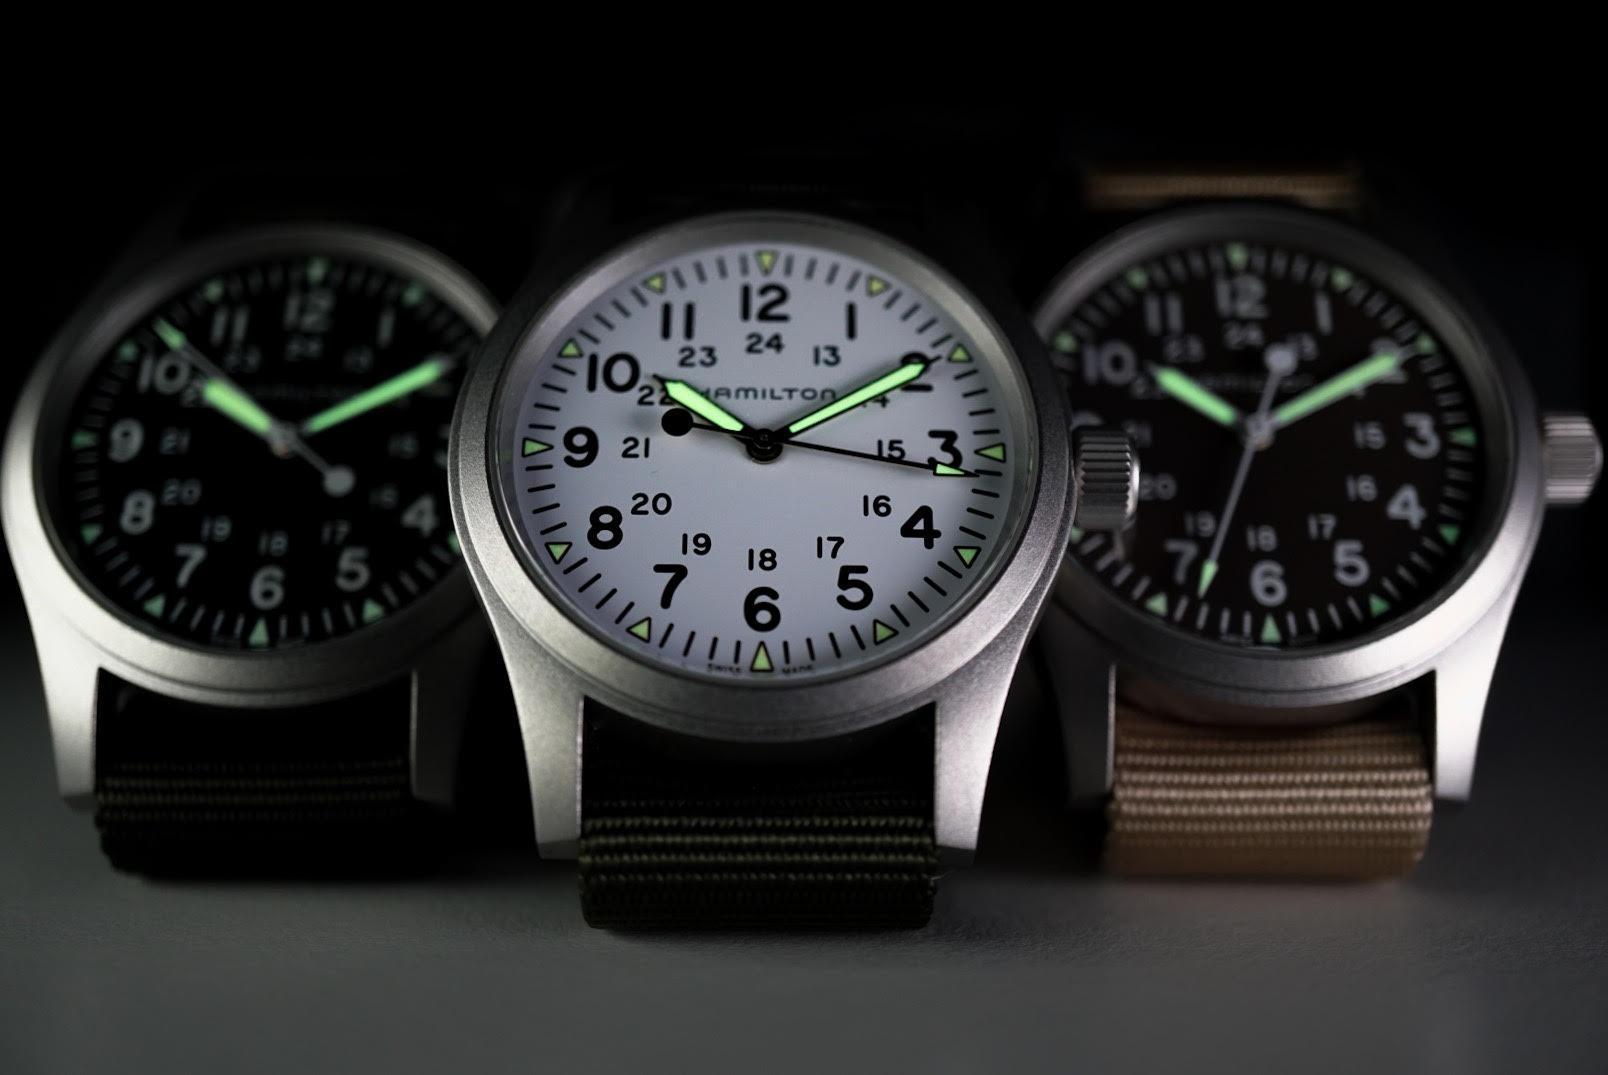 Introduction of Hamilton Khaki Field Watches